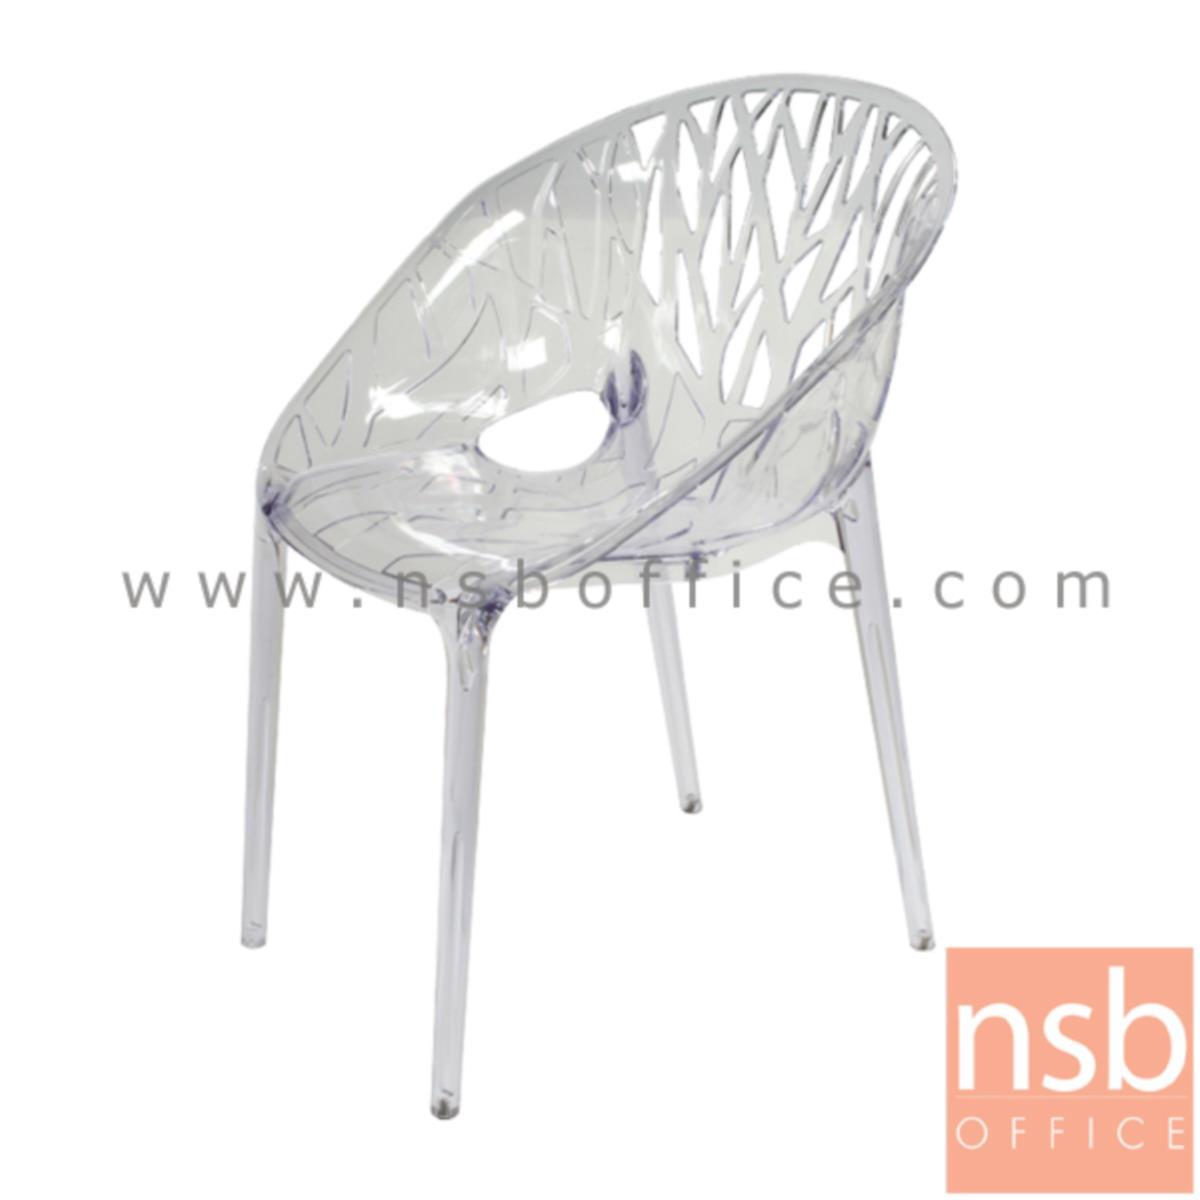 B29A085:เก้าอี้โมเดิร์นพลาสติกเงา(PC)ล้วน รุ่น PP9269 ขนาด 61W cm.